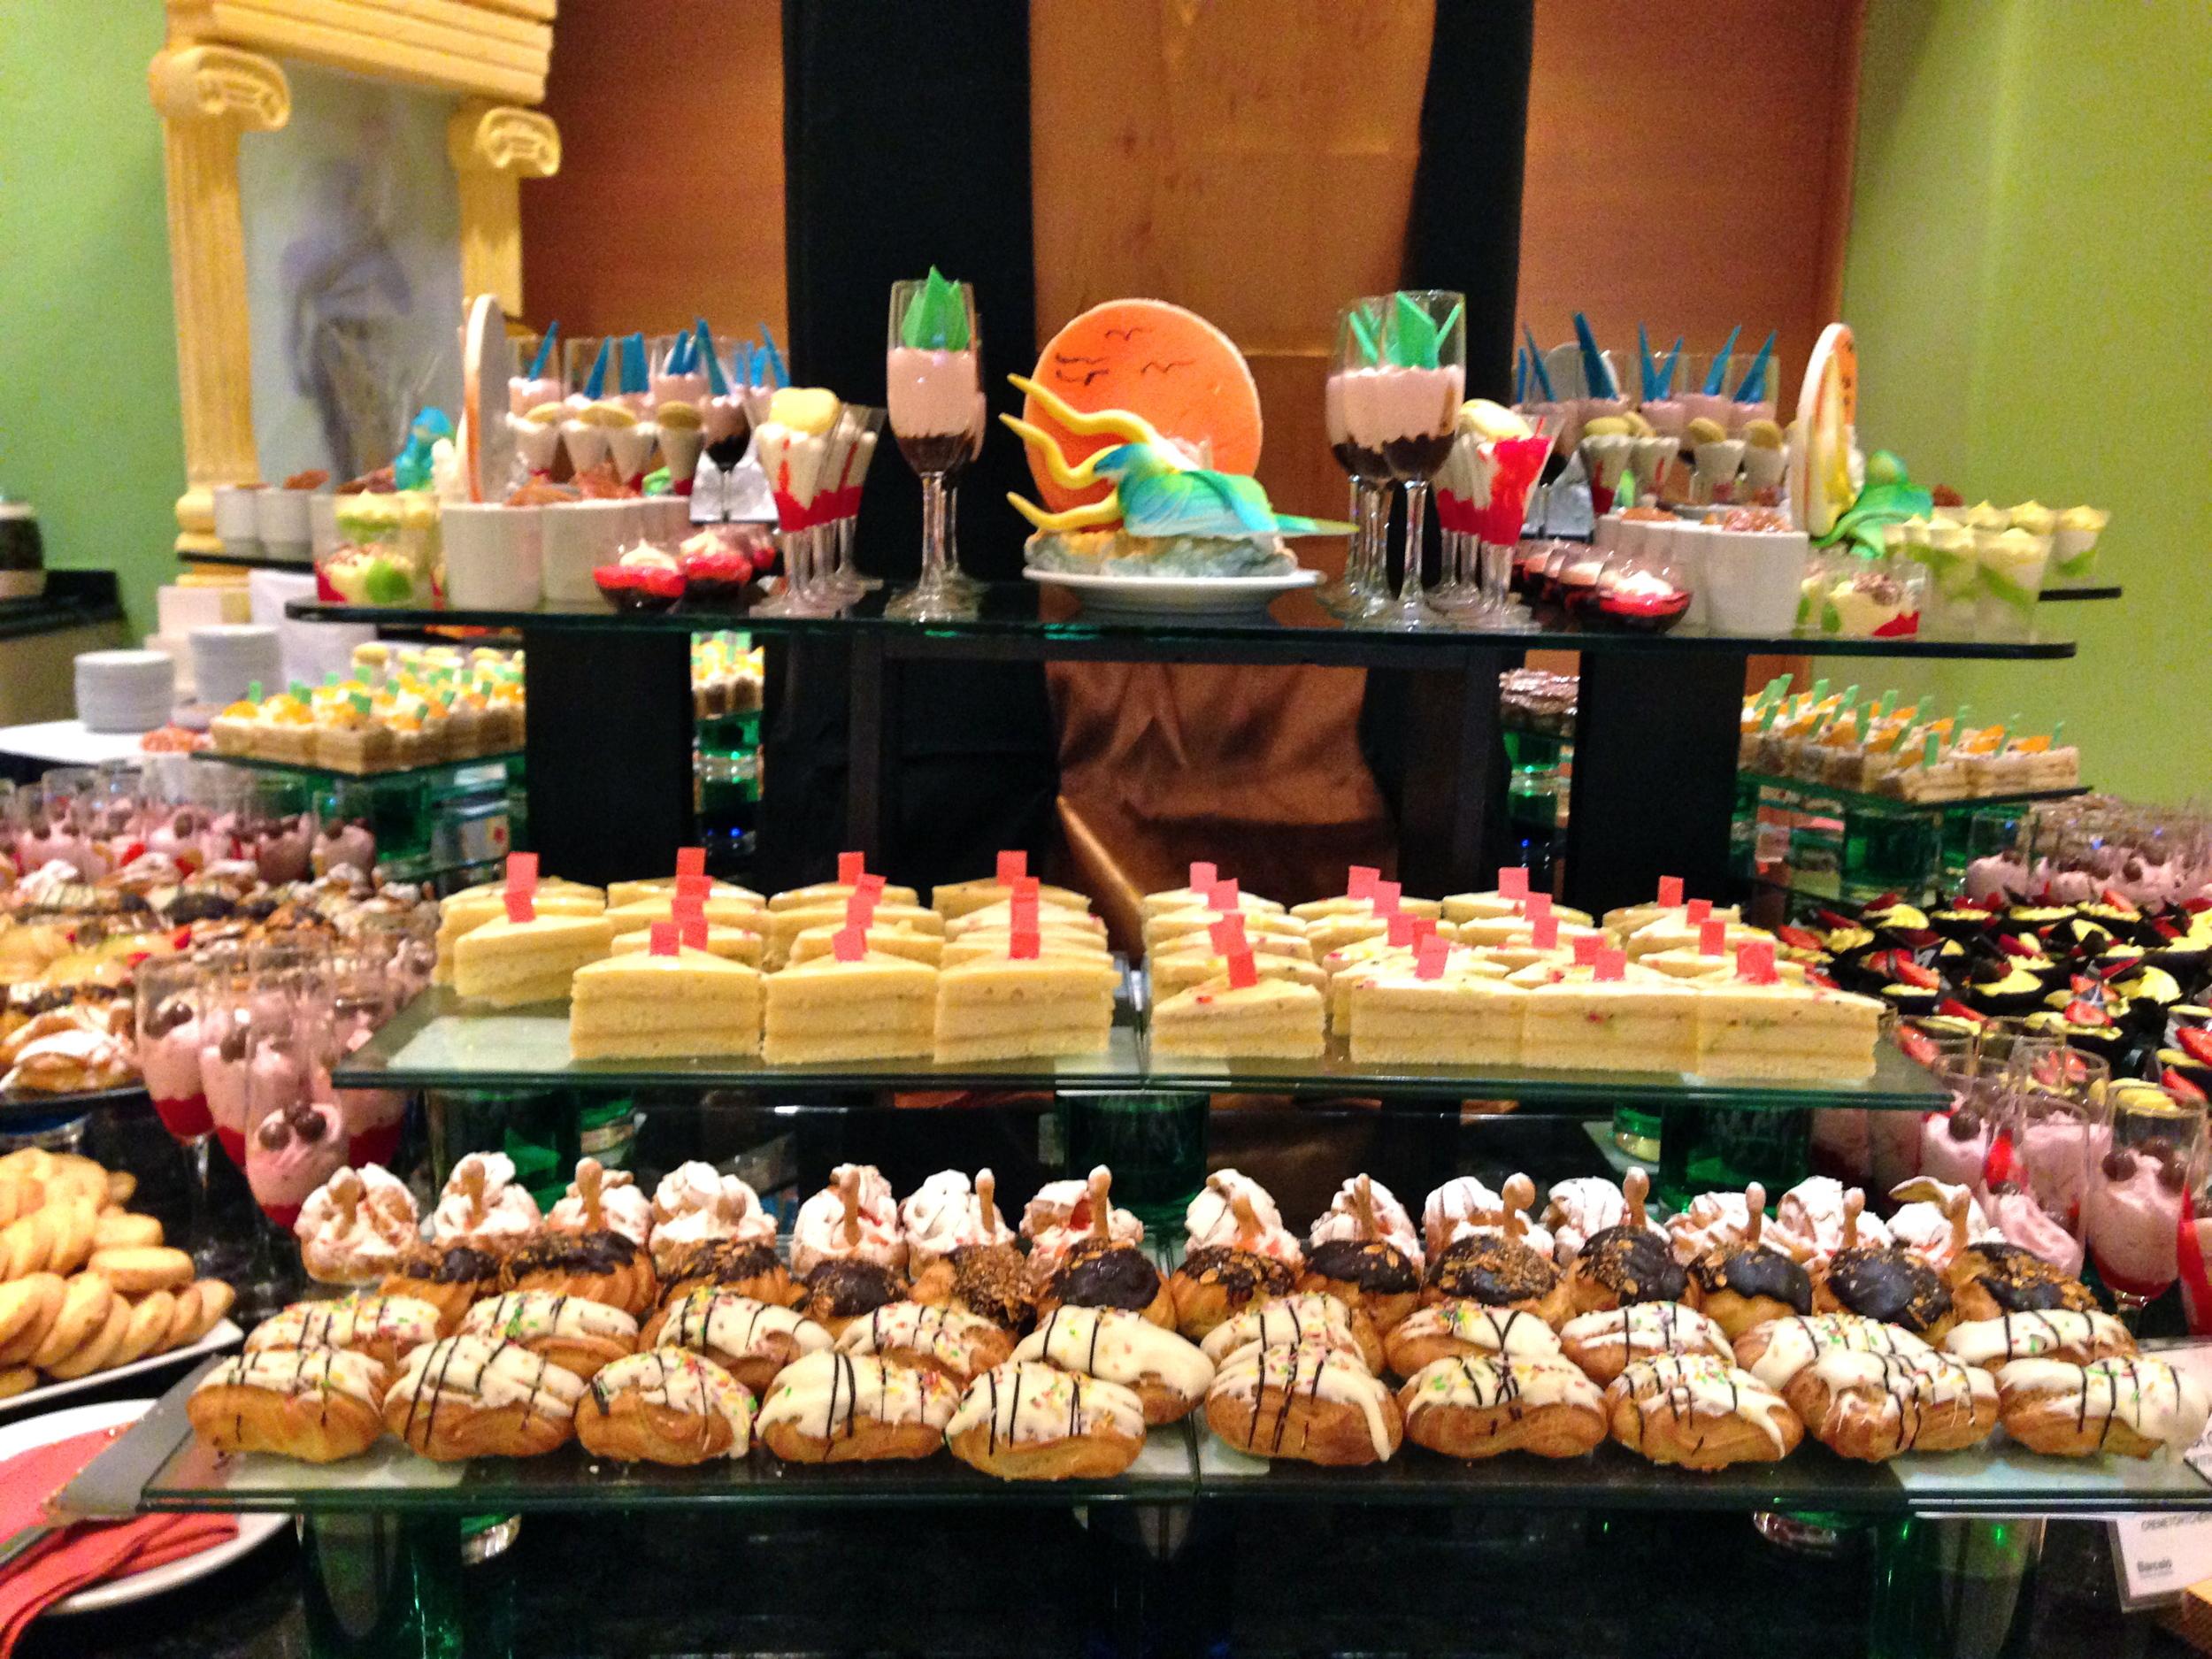 umm, DUHH I had to capture the wonder of this dessert table.